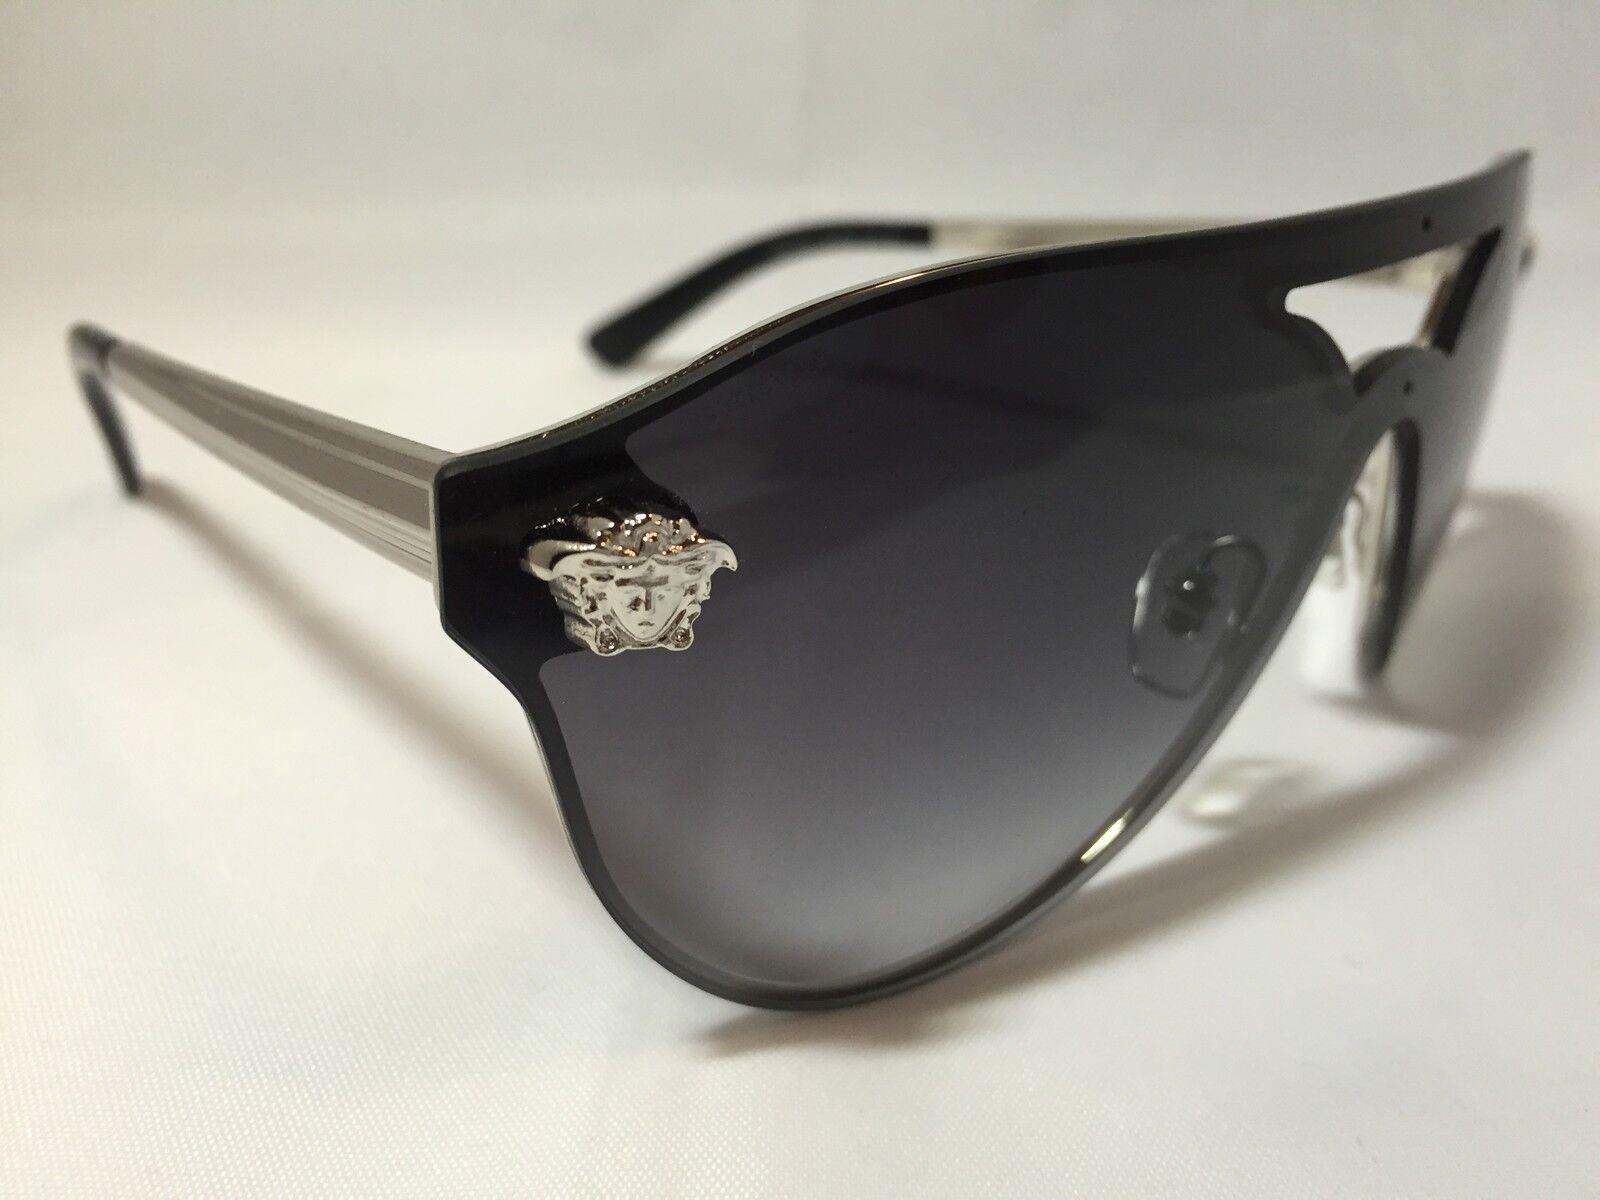 100ff6efb9001 New Unique Rimless Authentic Versace Sunglasses « One More Soul